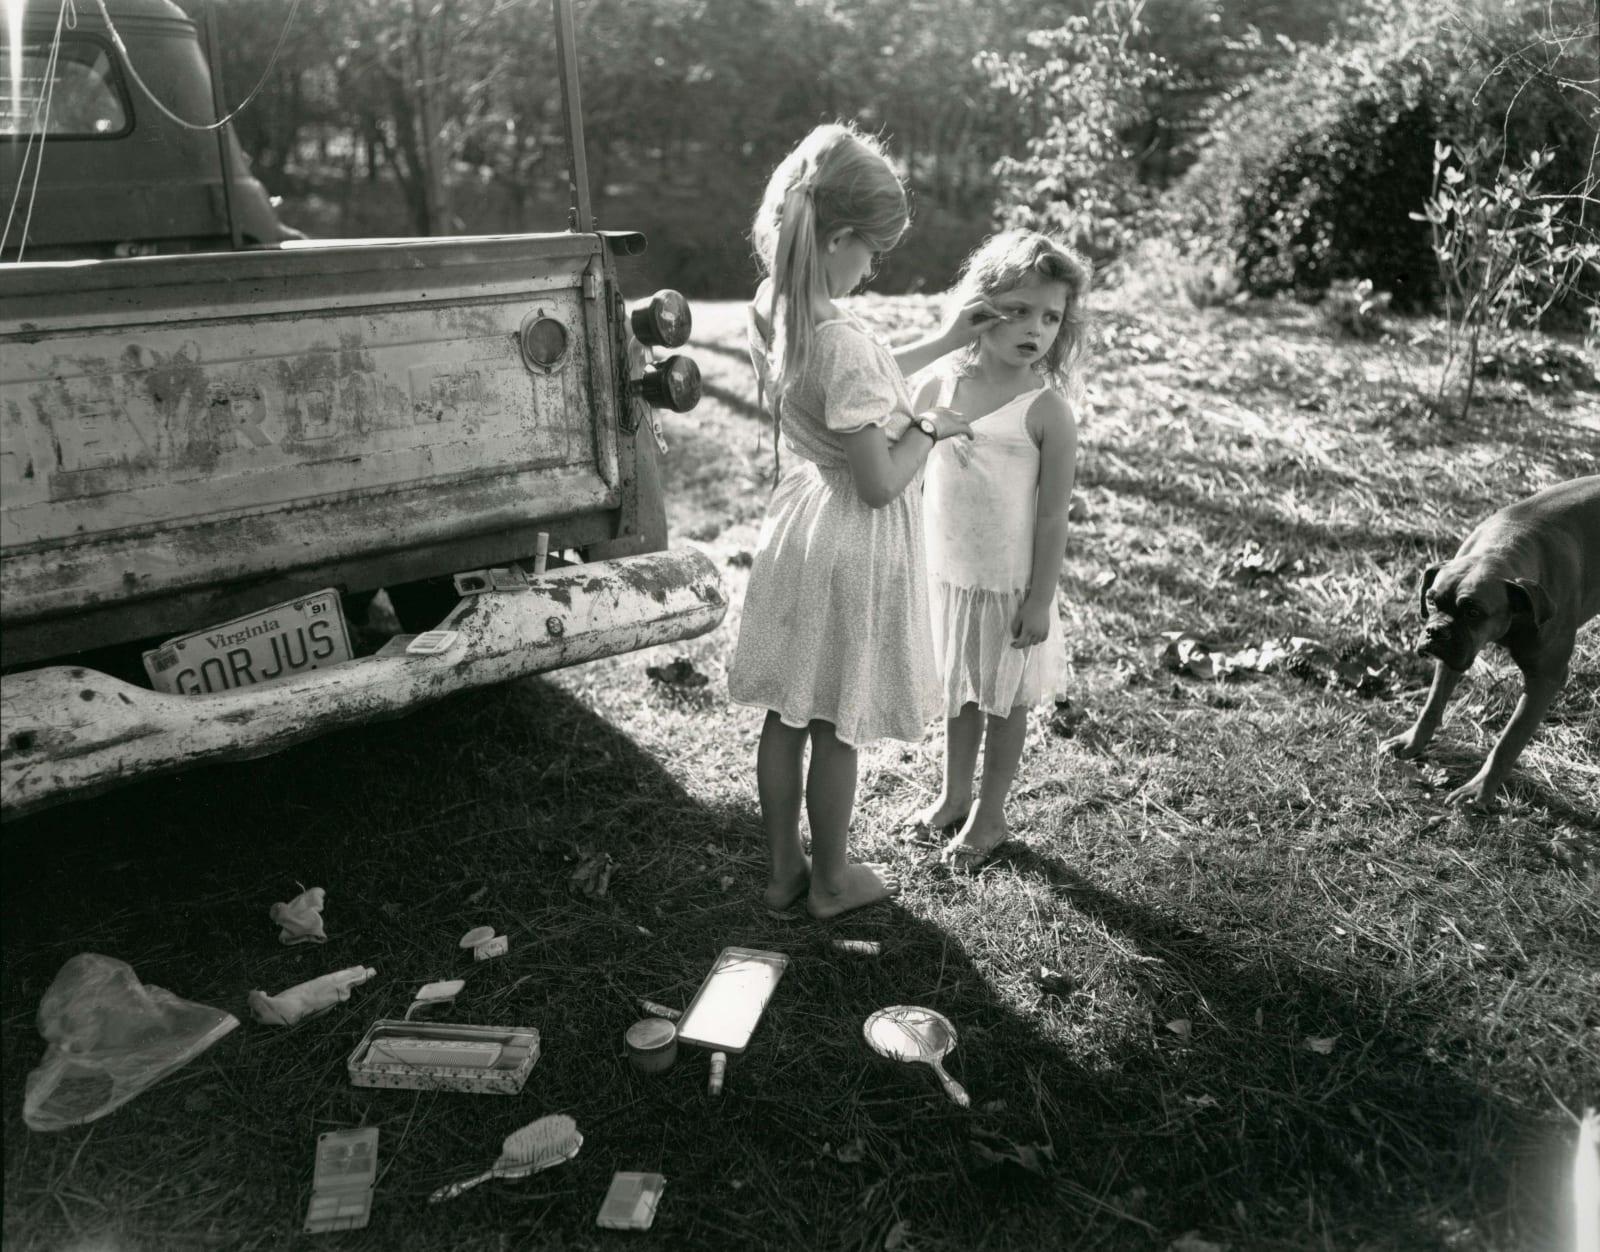 Sally Mann, Gorjus, 1989